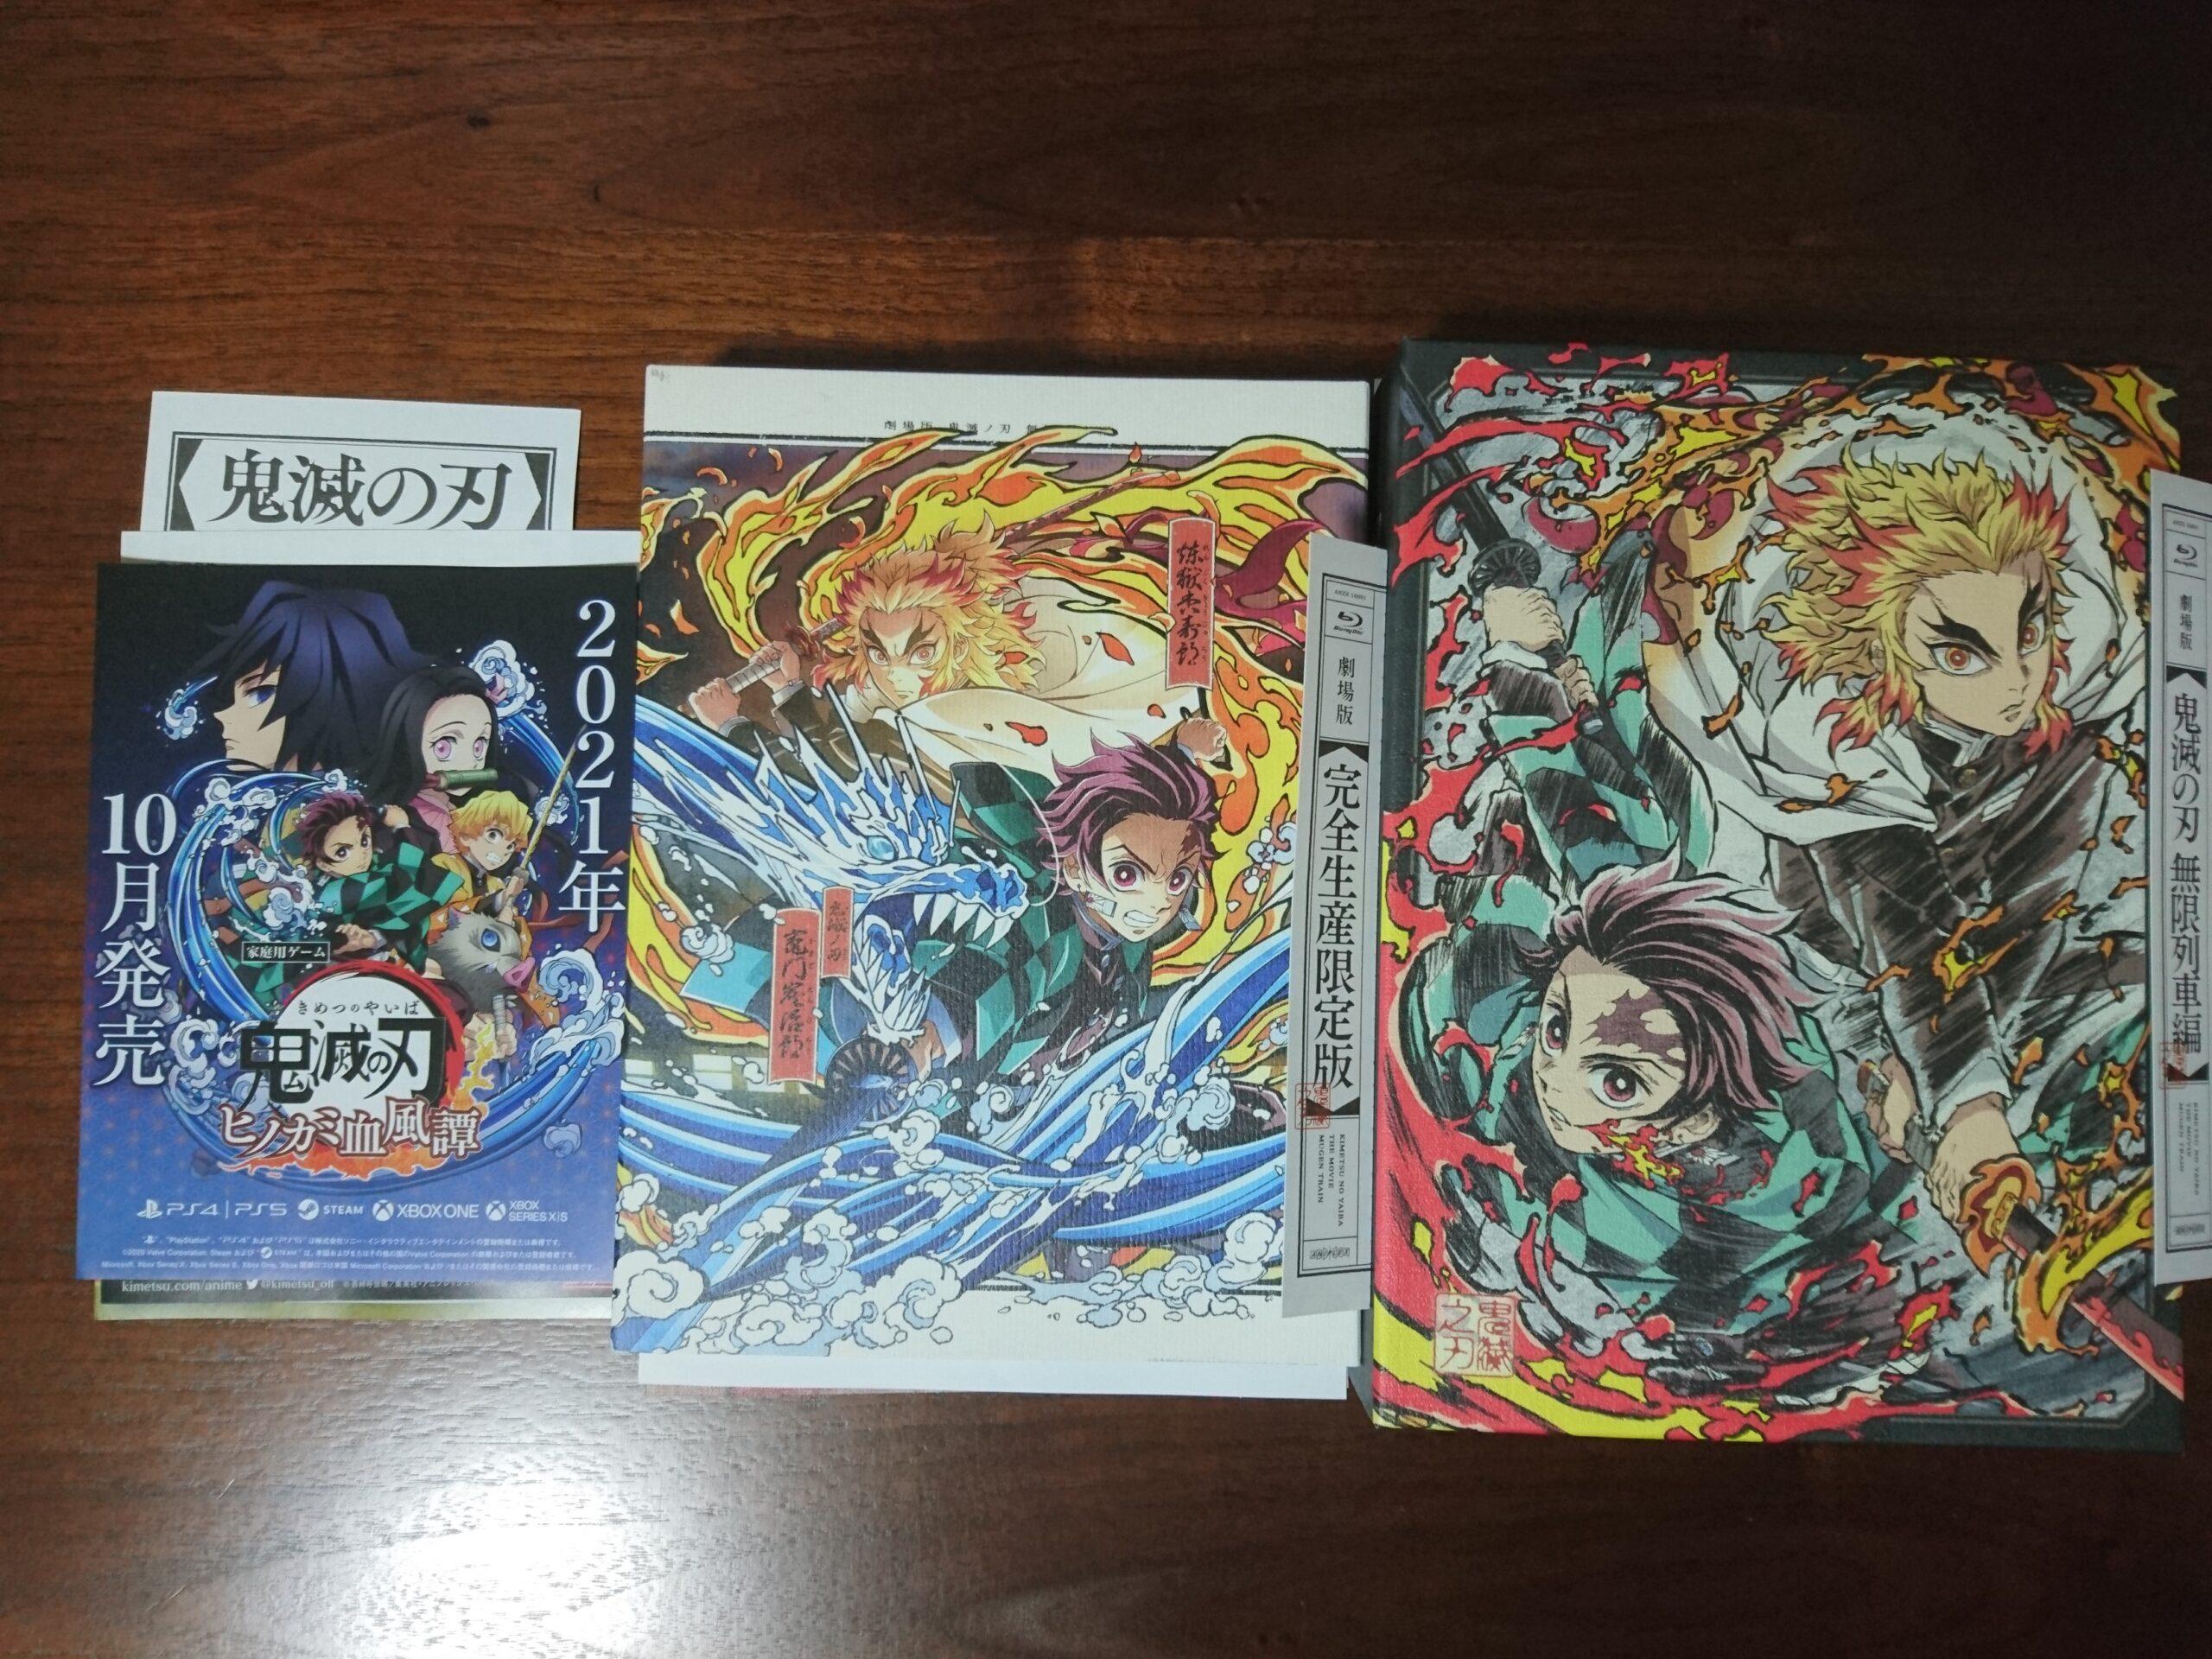 Přehled novinek z Japonska 24. týdne Demon Slayer Game Flyer 06 15 21 scaled 1